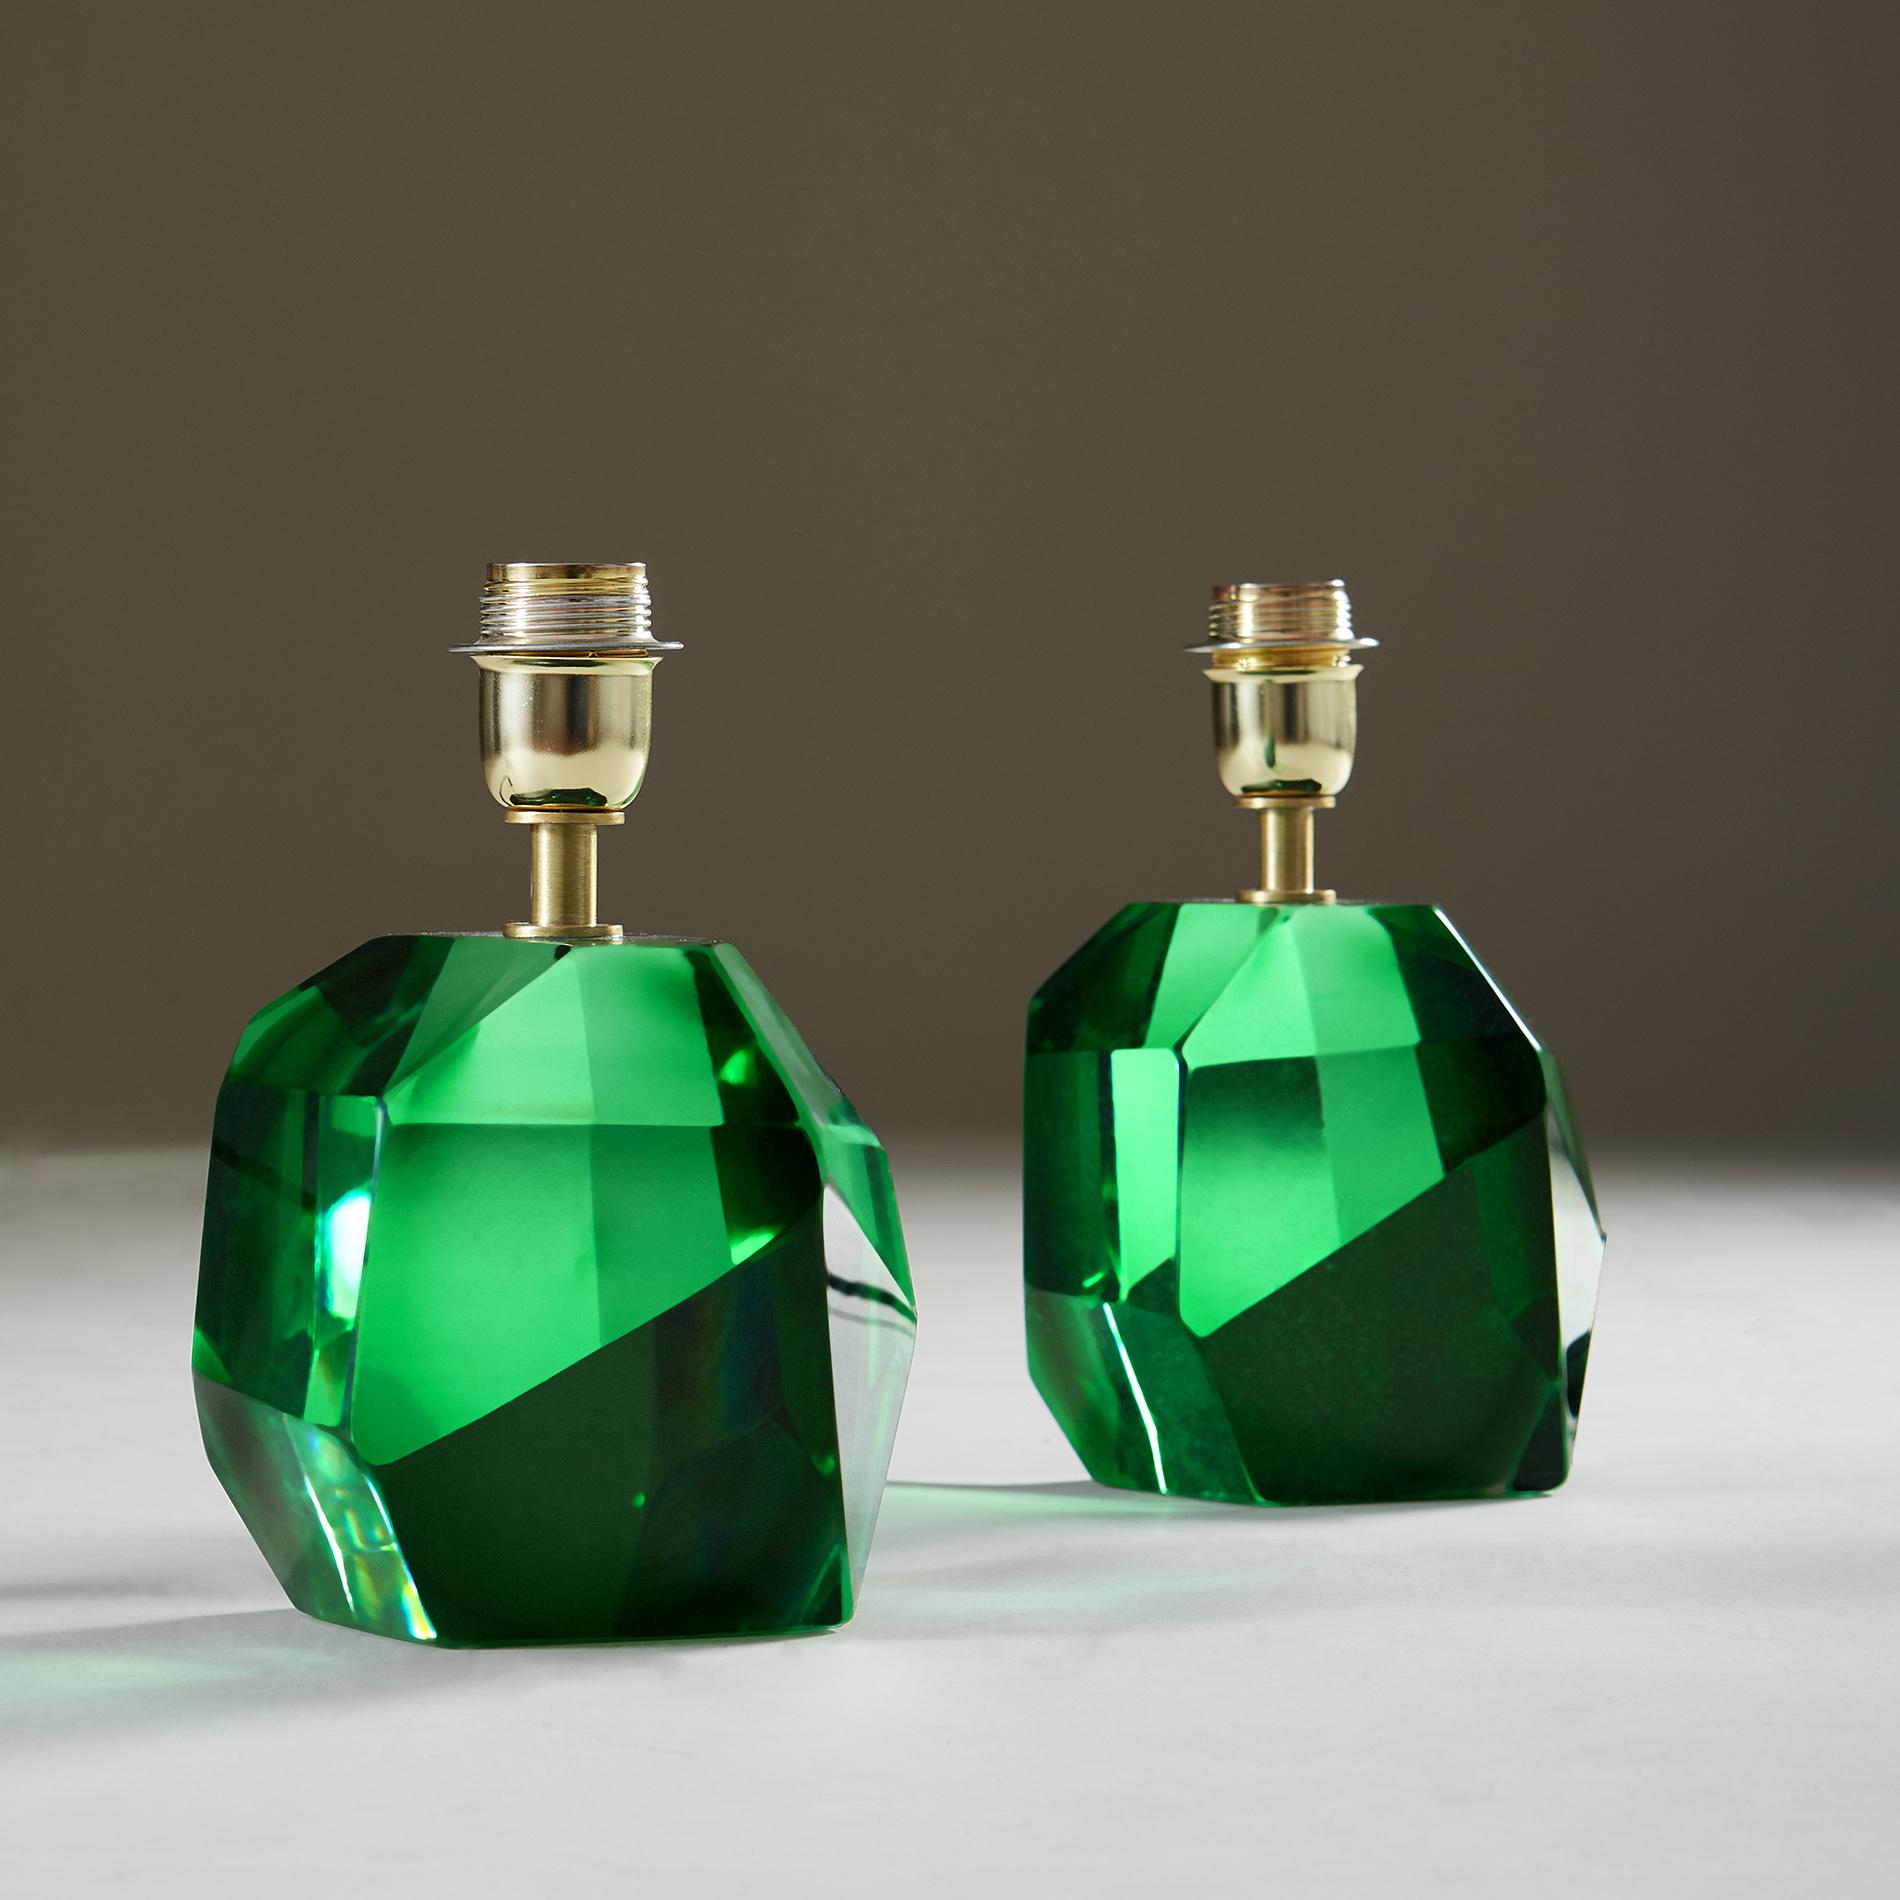 Emerald Green Rock Lamp 20210225 Valerie Wade 2 220 V1